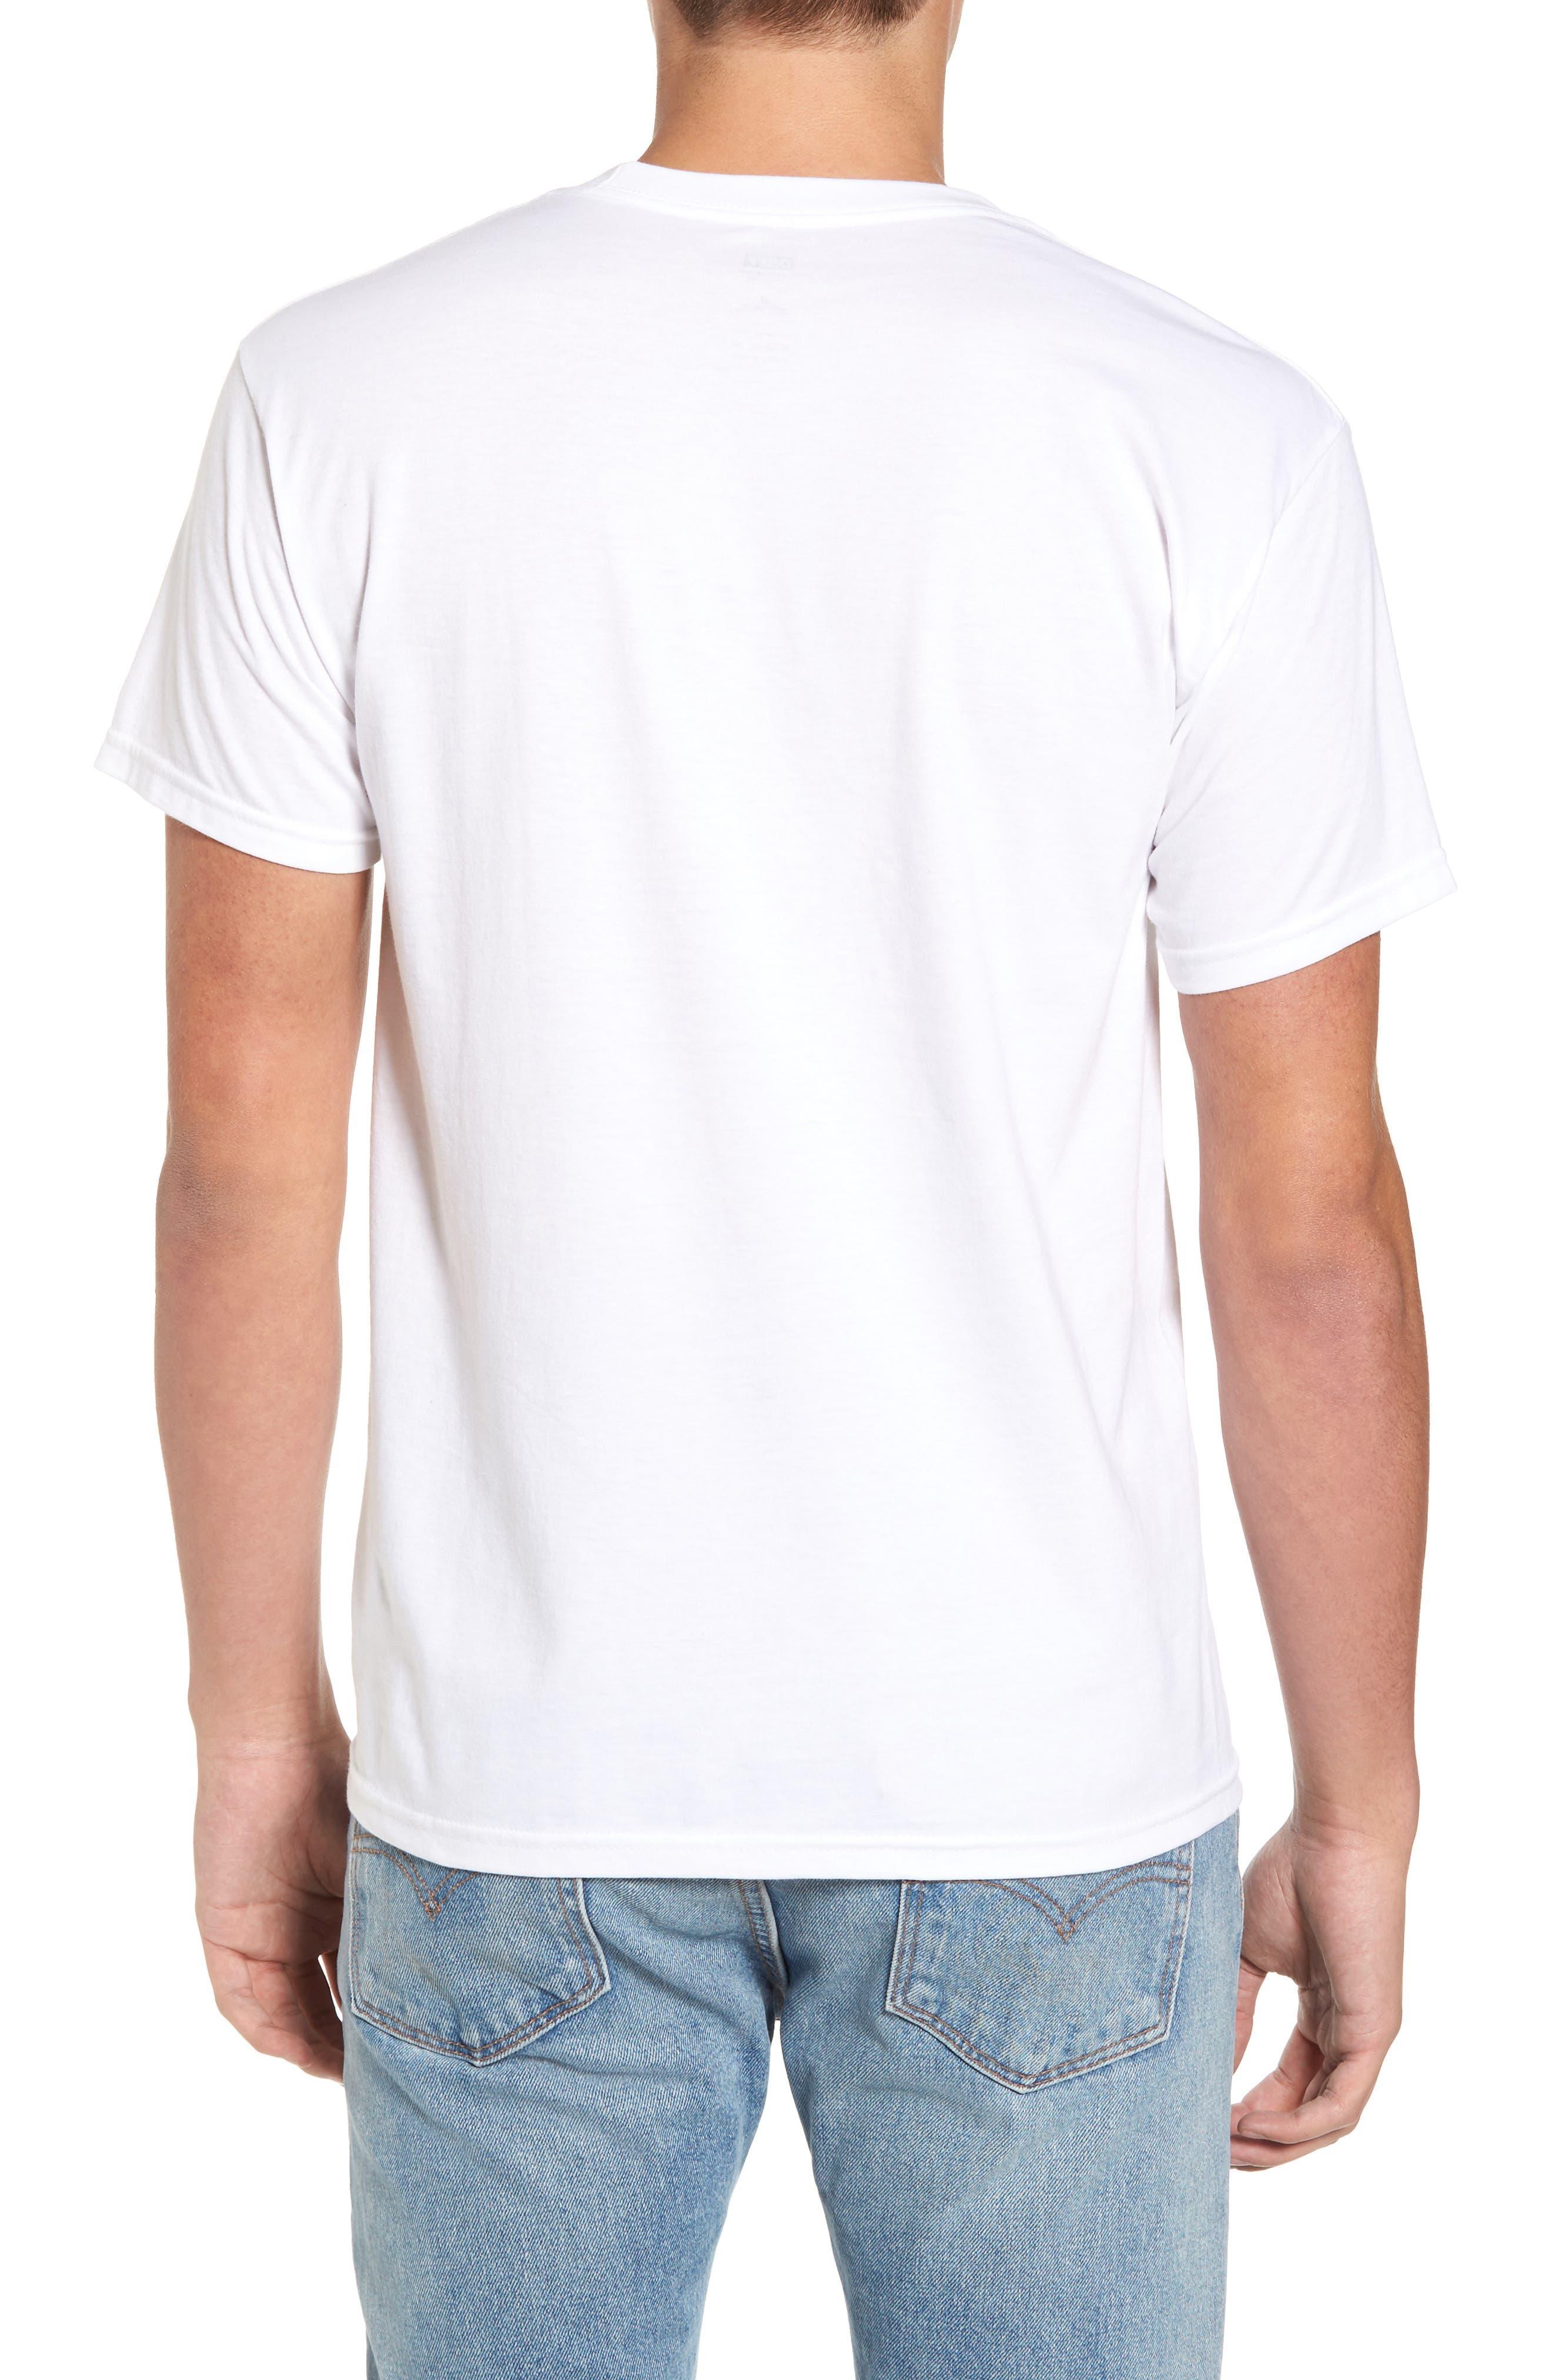 VIP Premium T-Shirt,                             Alternate thumbnail 2, color,